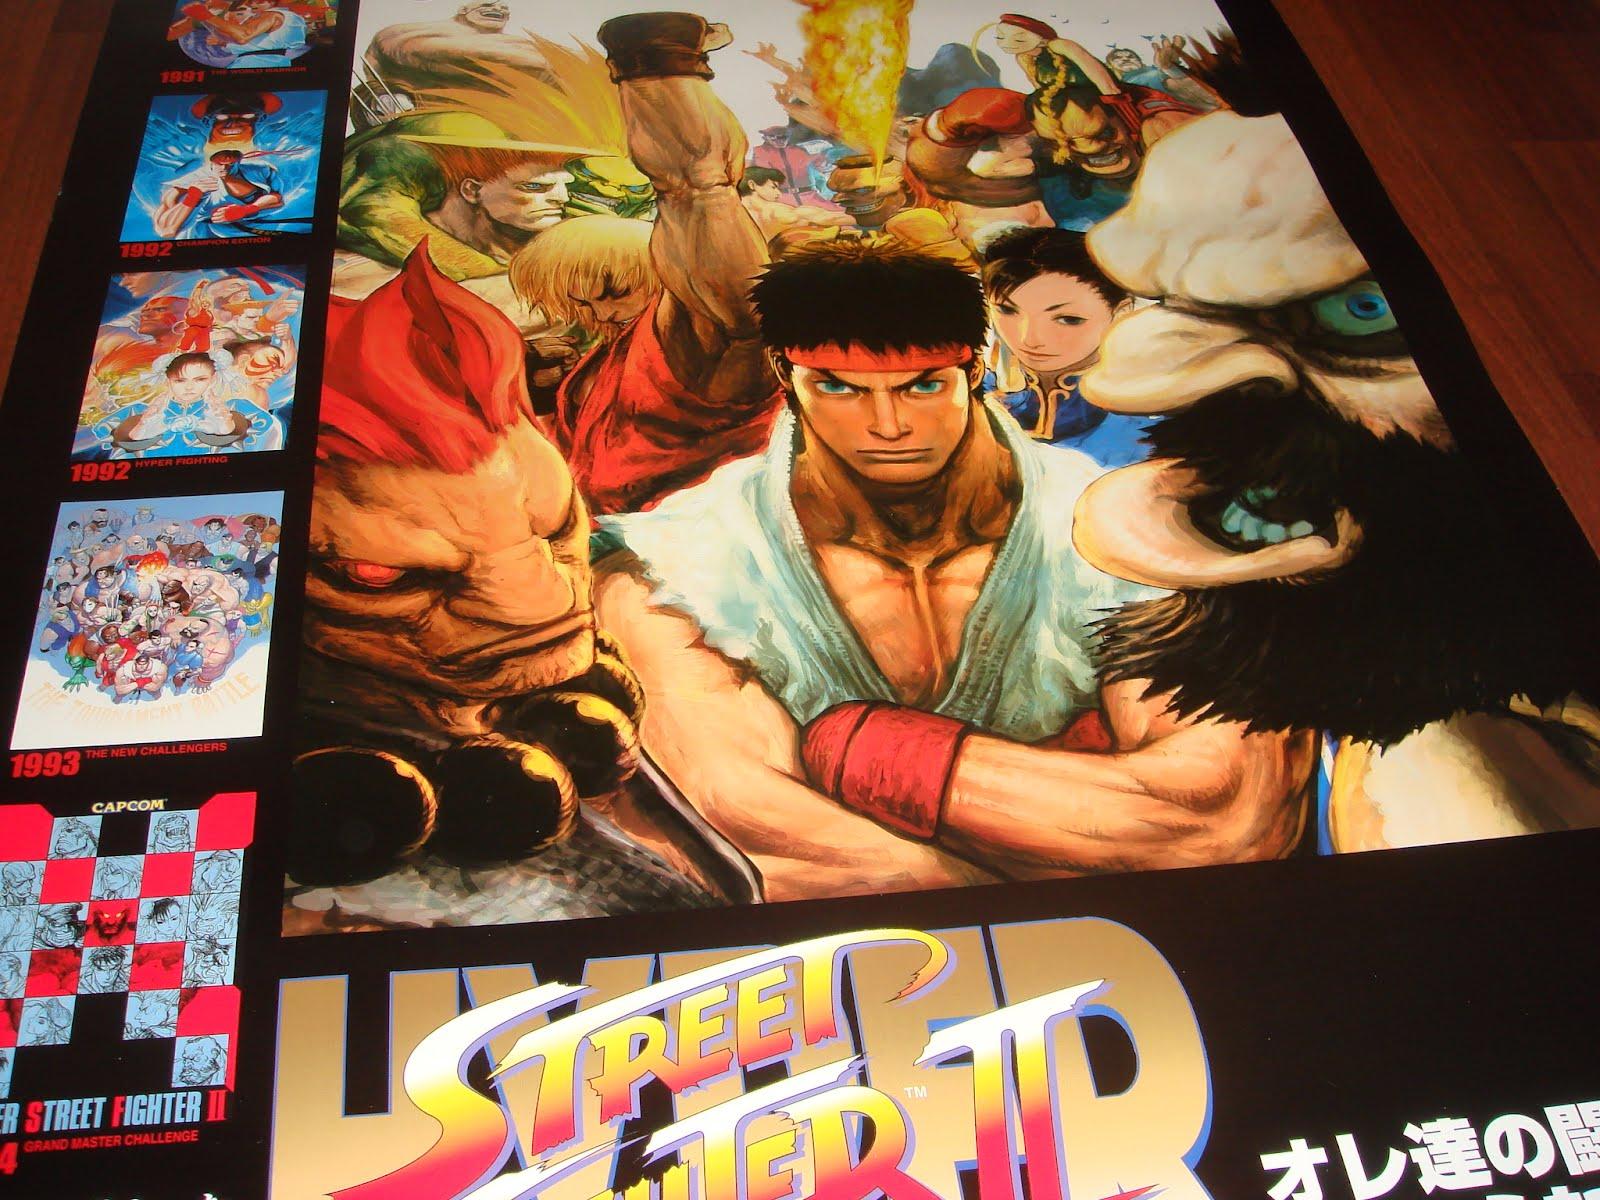 ARCADE4LIFE: *New Arrivals* Hyper Street Fighter 2 B1 Poster